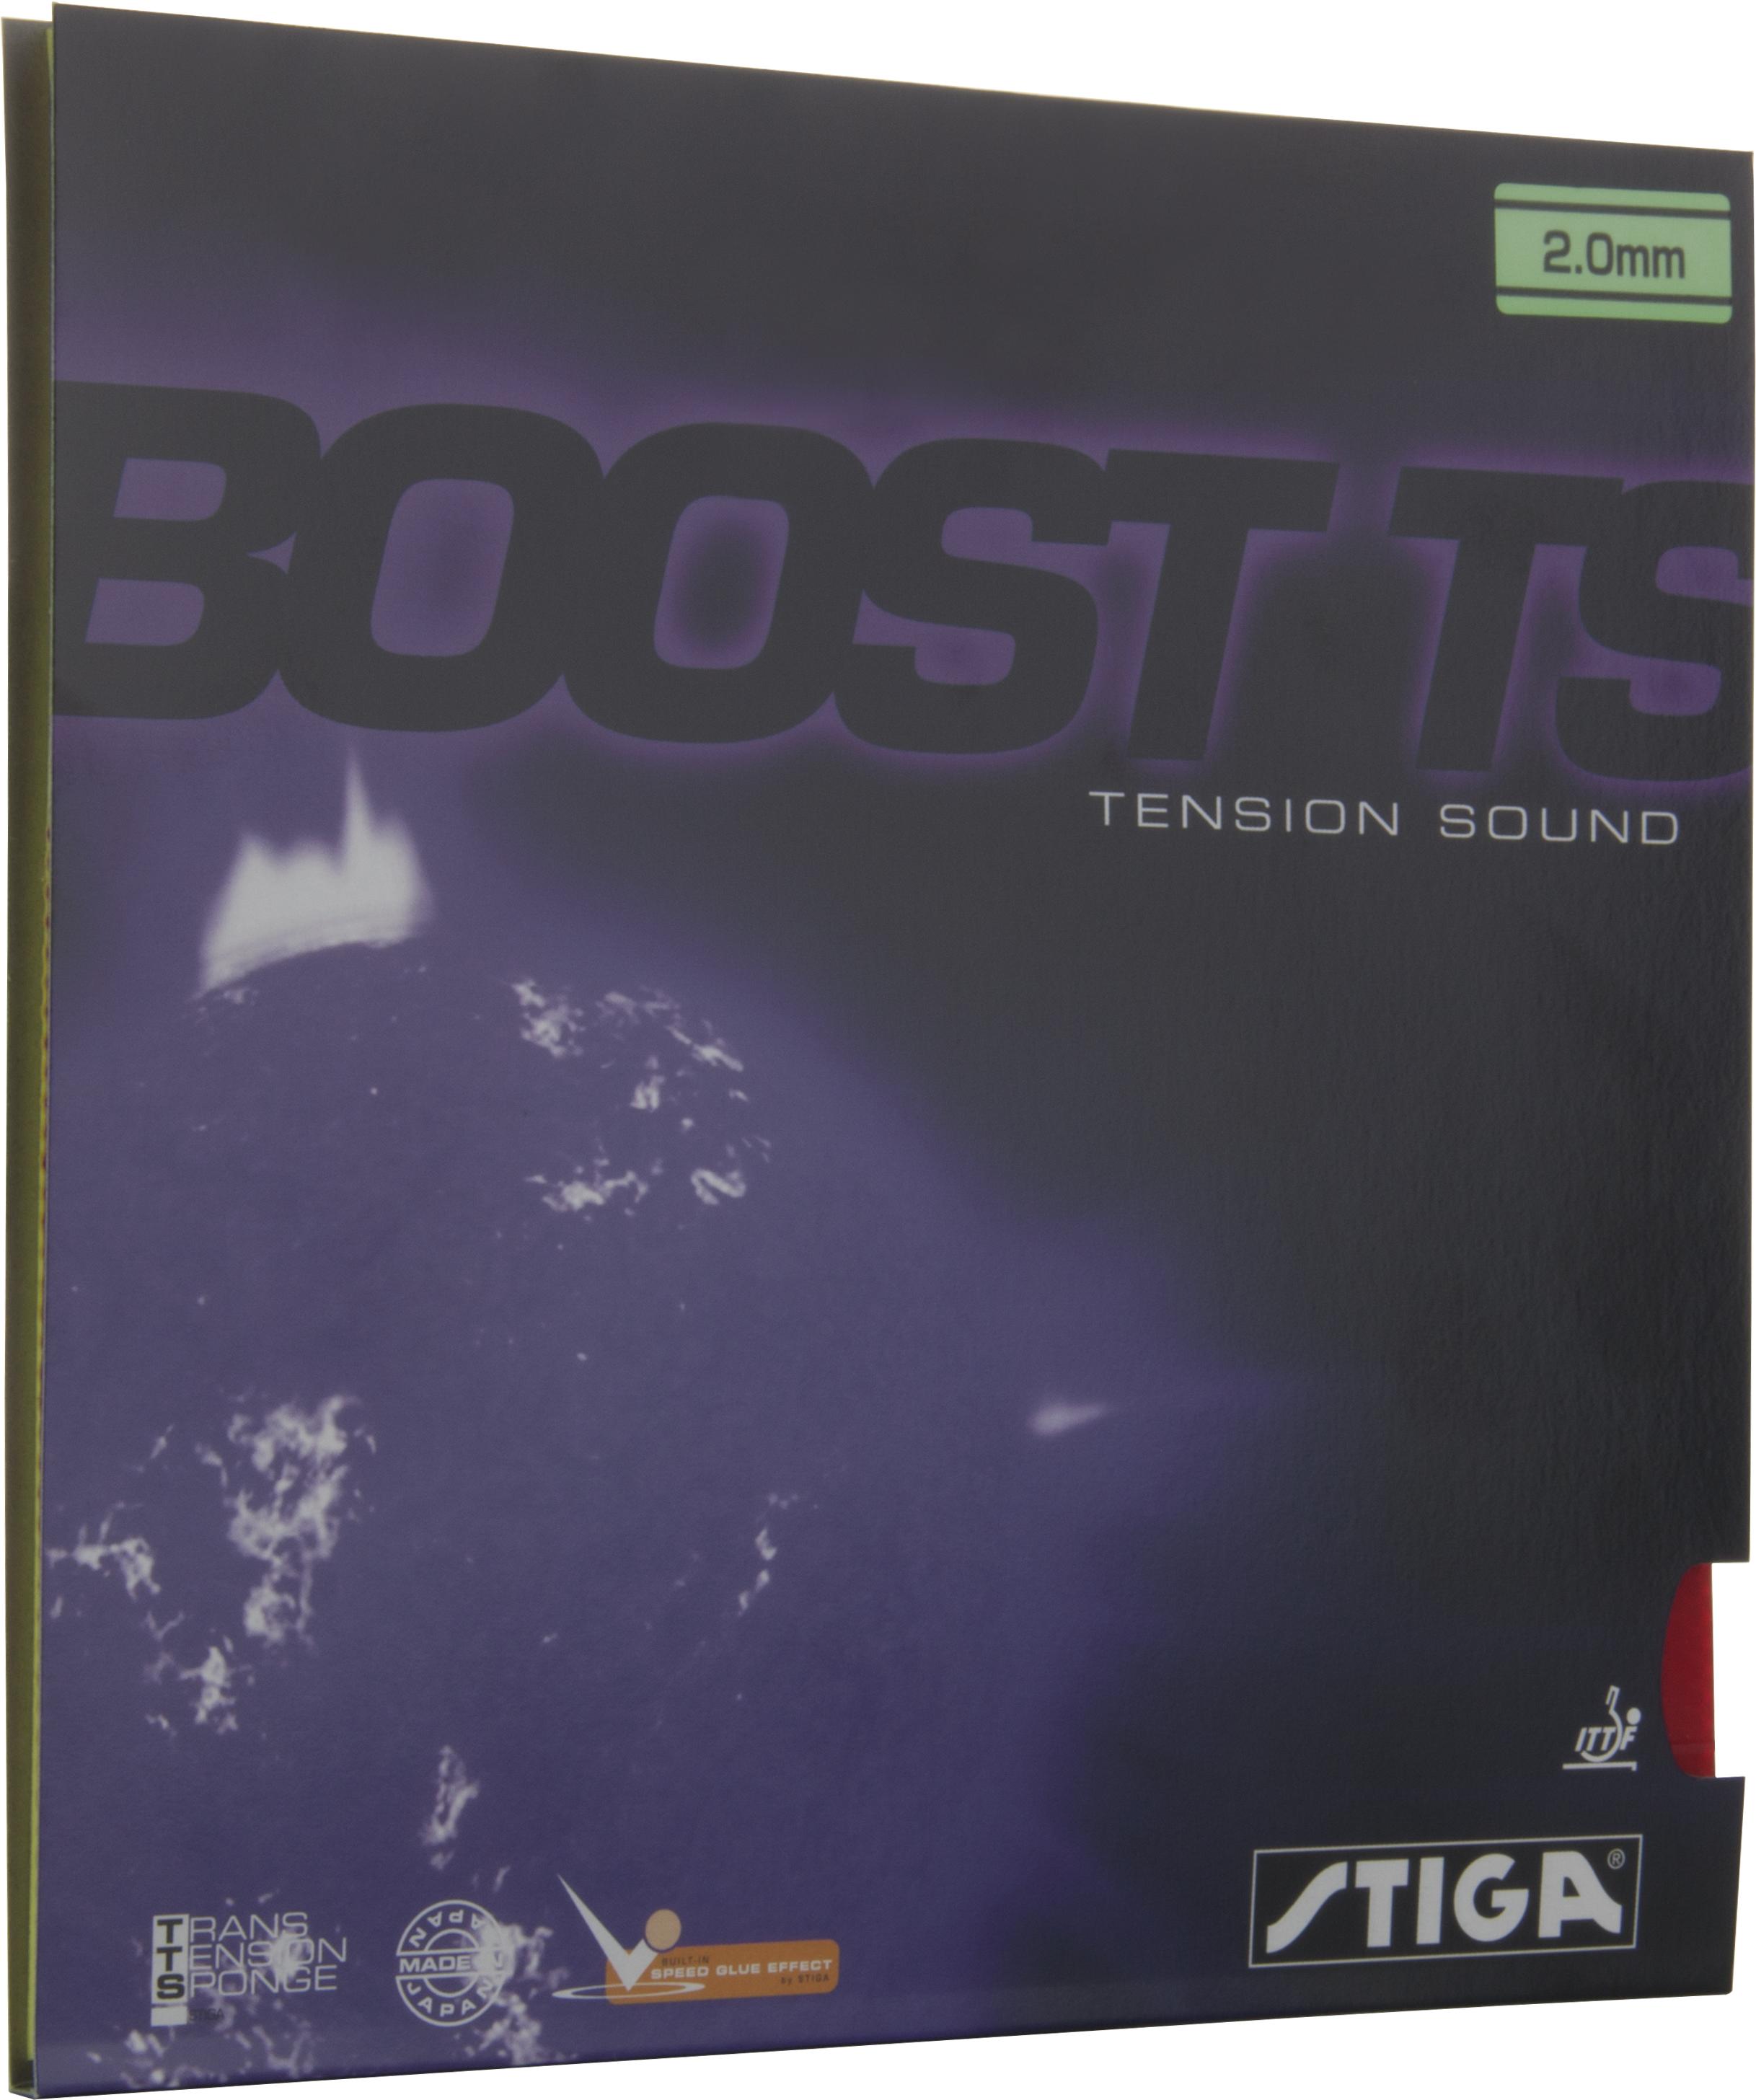 stiga-boost-ts-tischtennis-belag